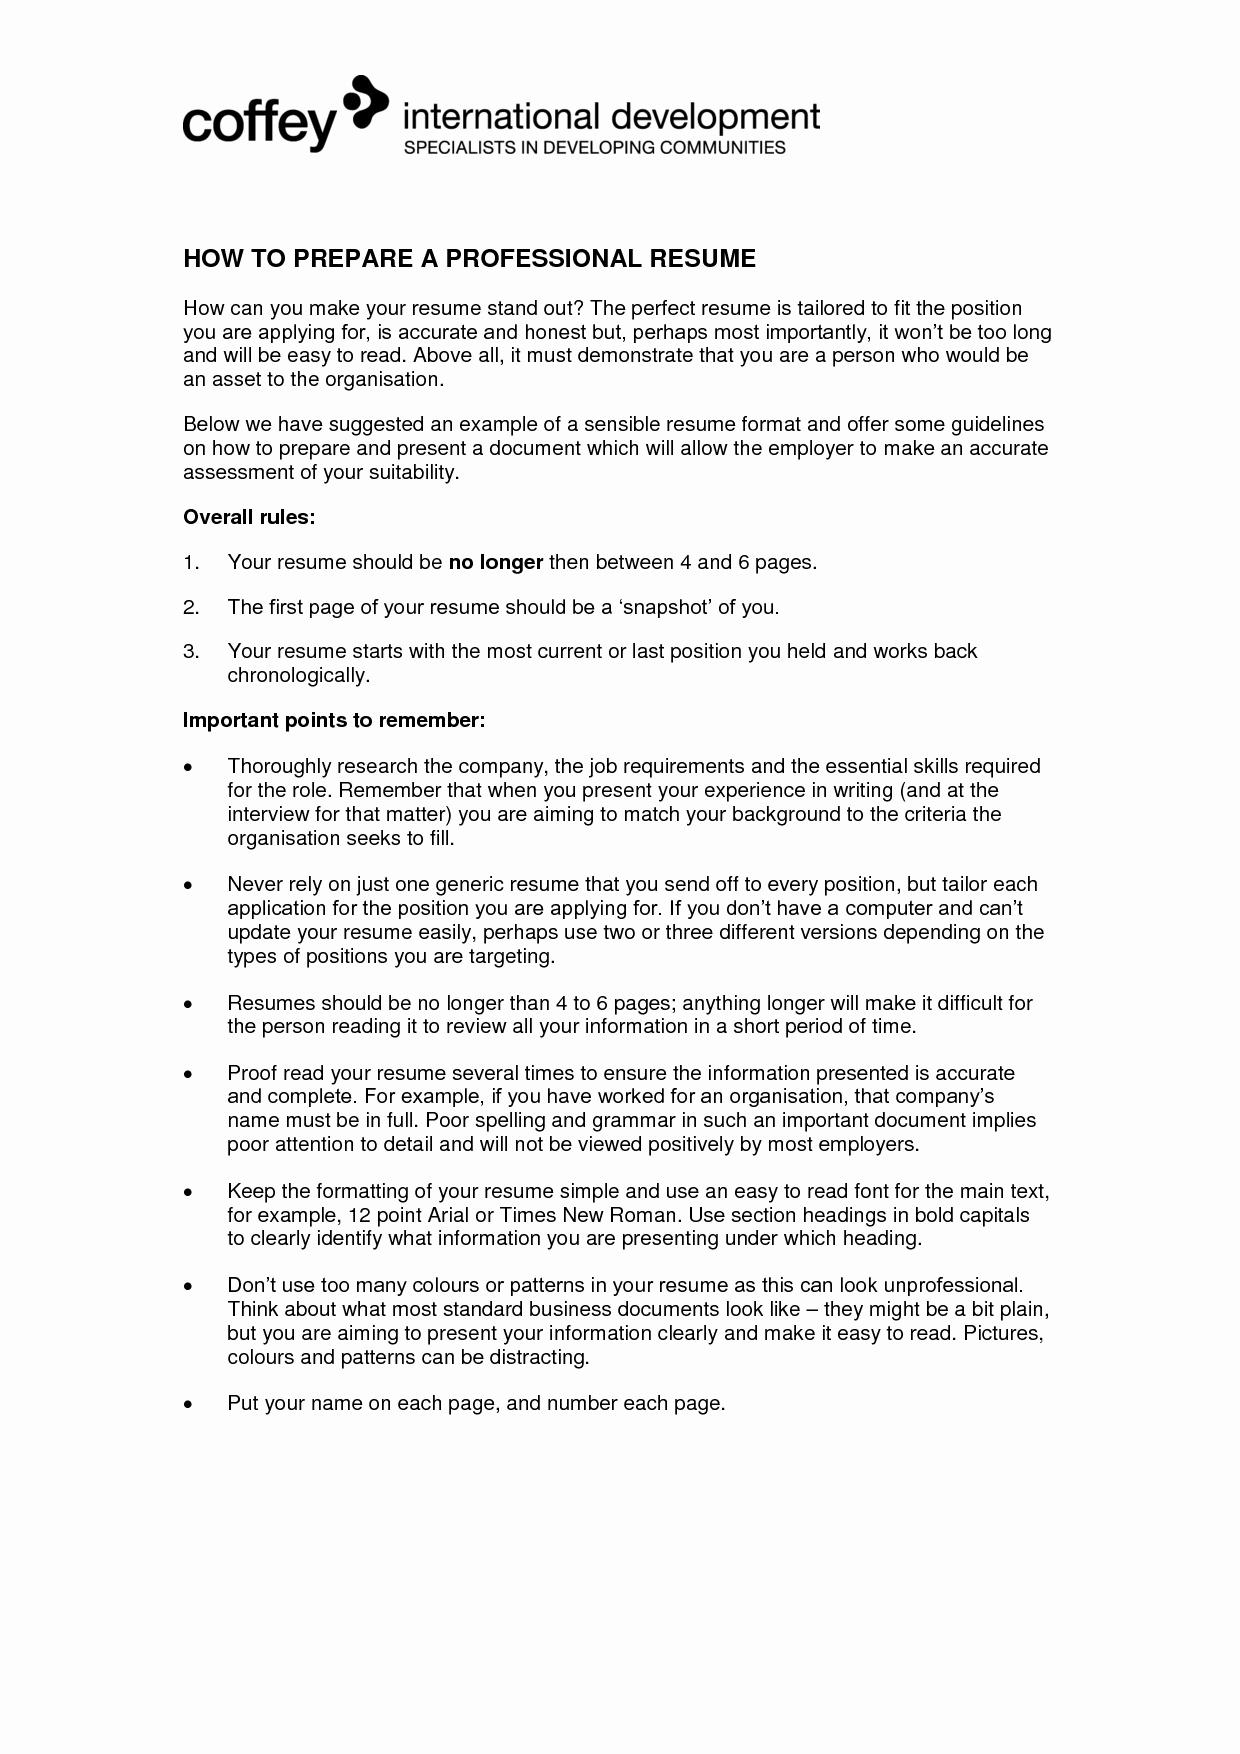 I Need Help Creating My Resume